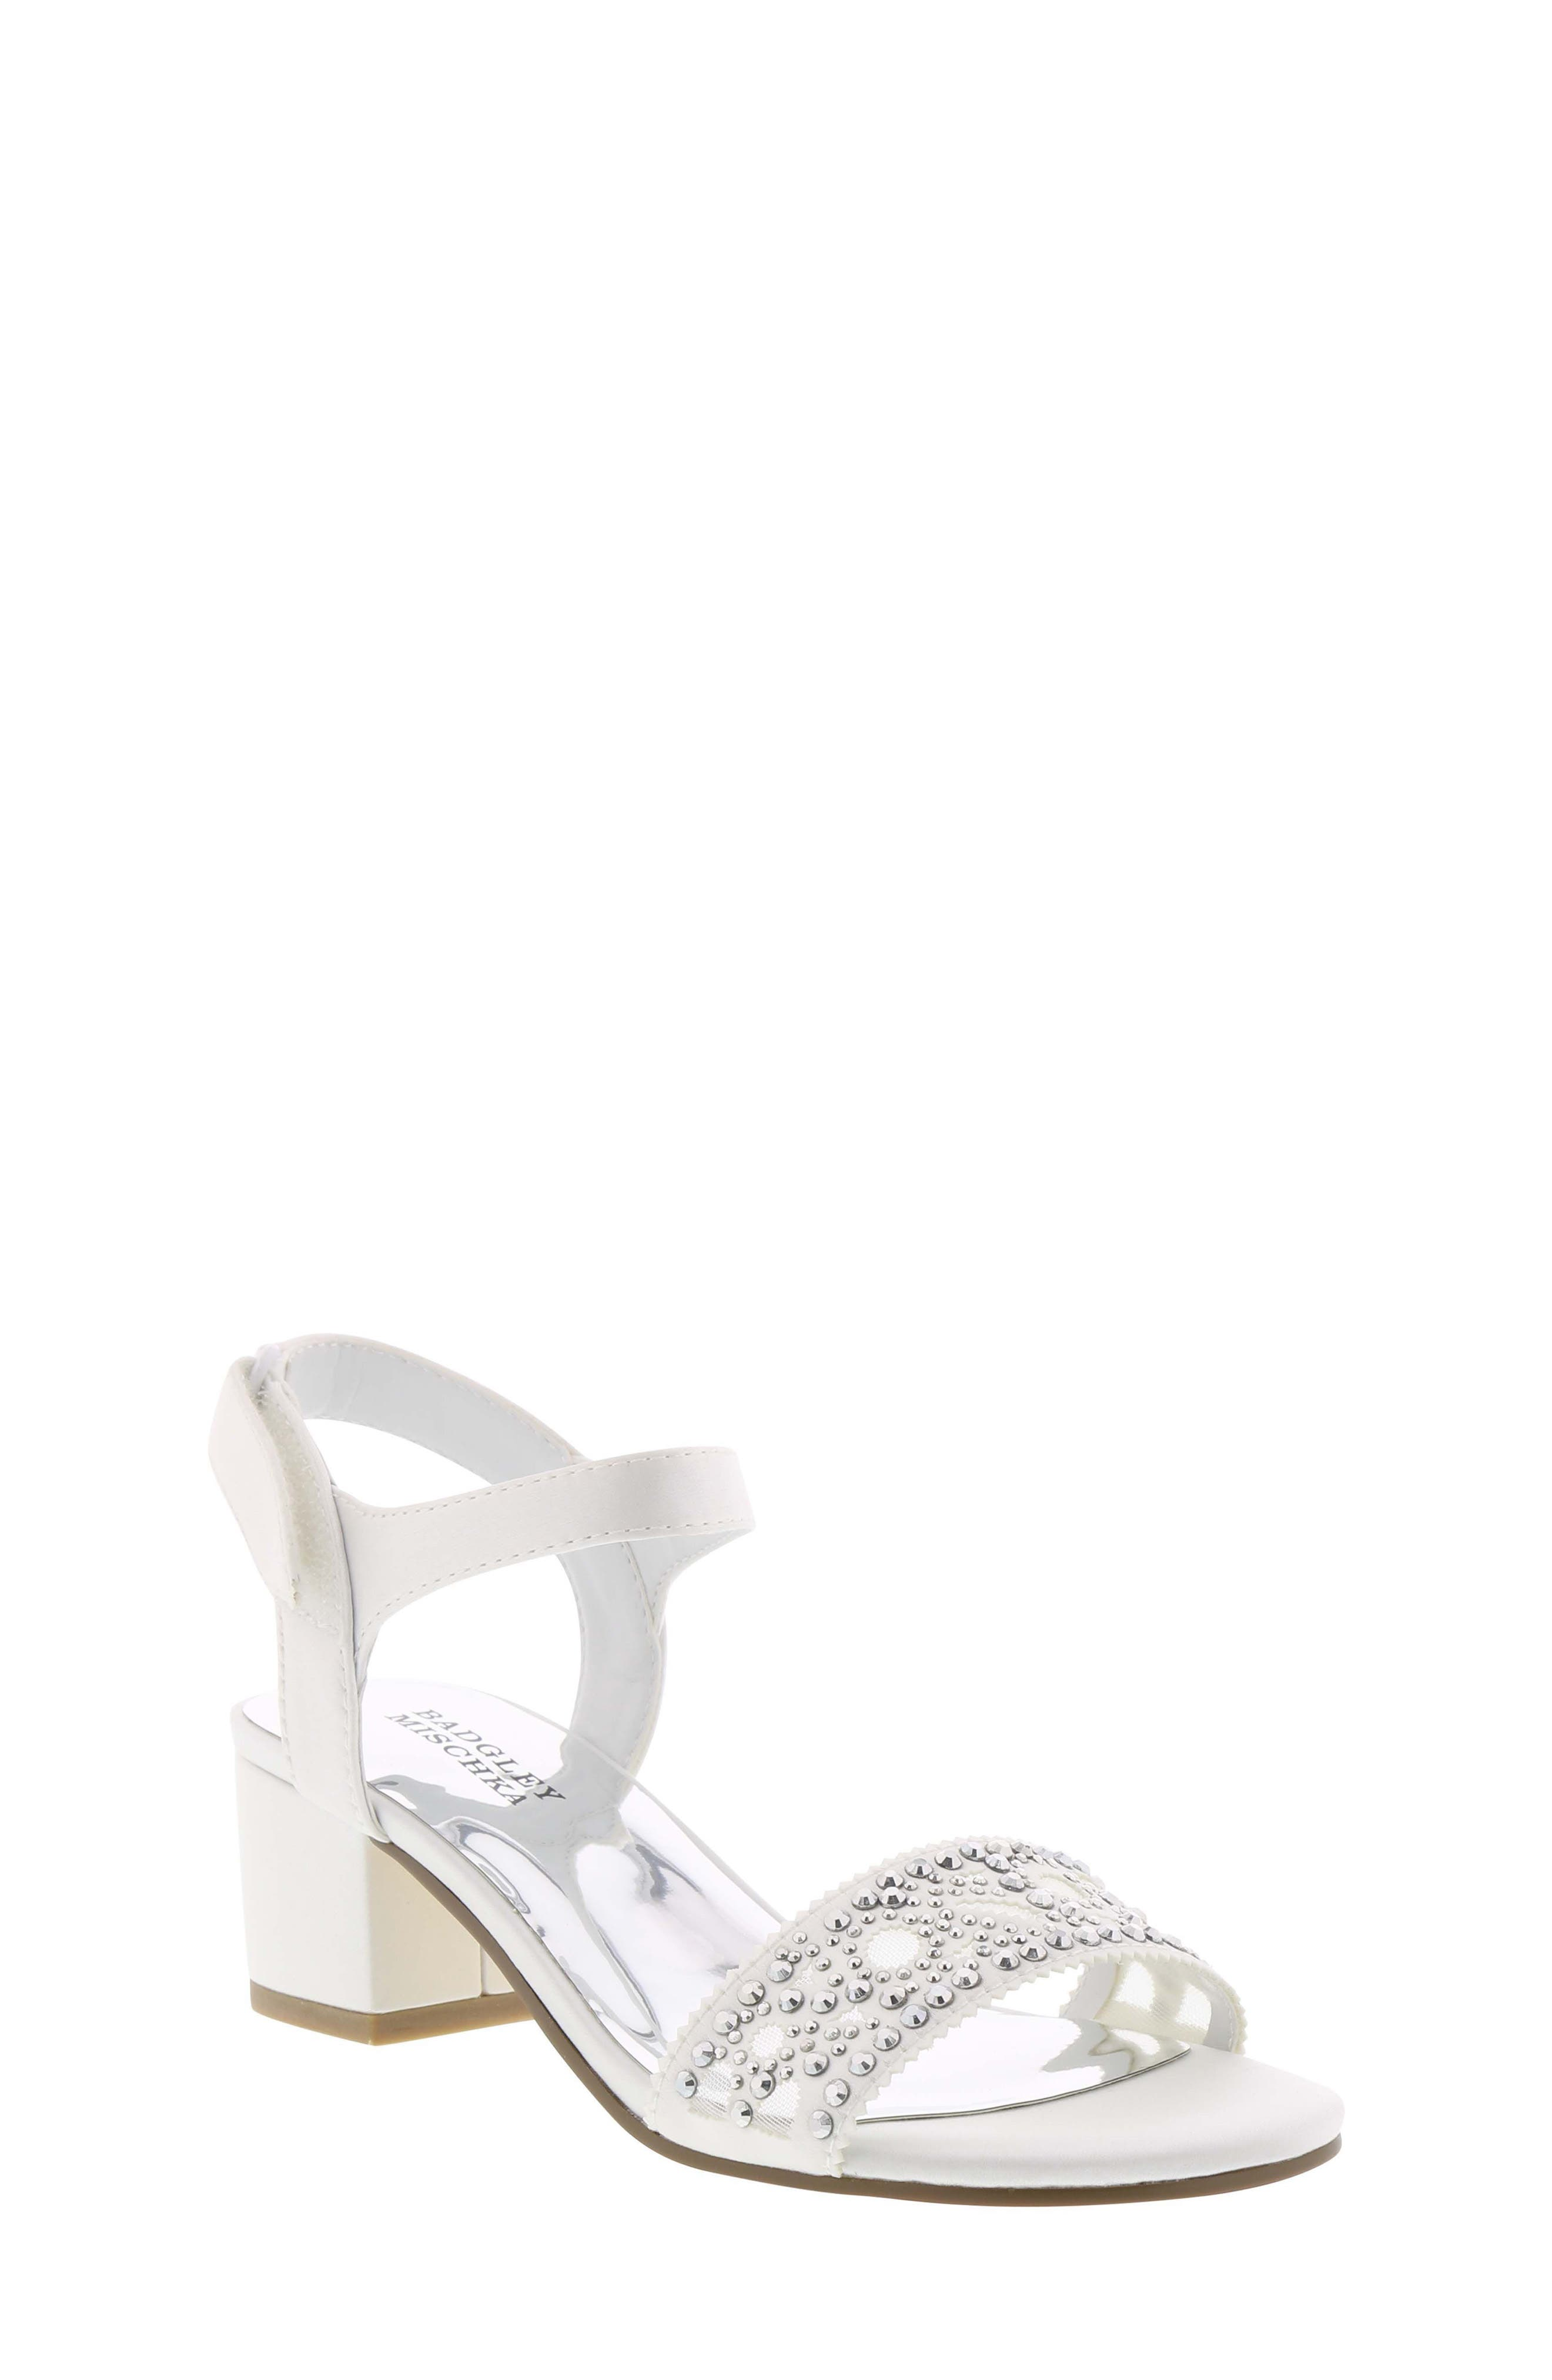 Ascot Gems Sandal,                         Main,                         color, White